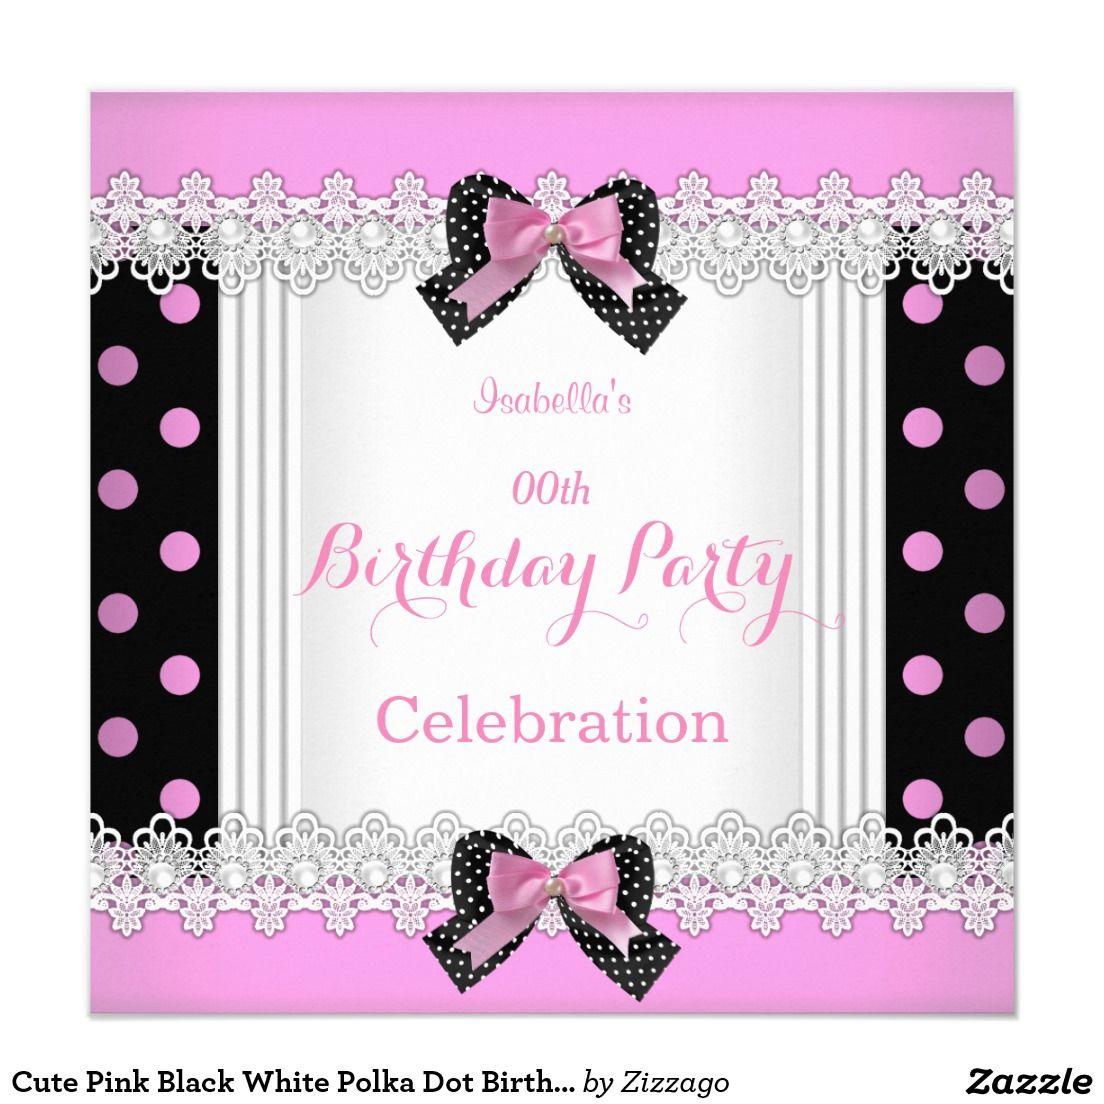 Cute Pink Black White Polka Dot Birthday Party Card | Polka dot ...